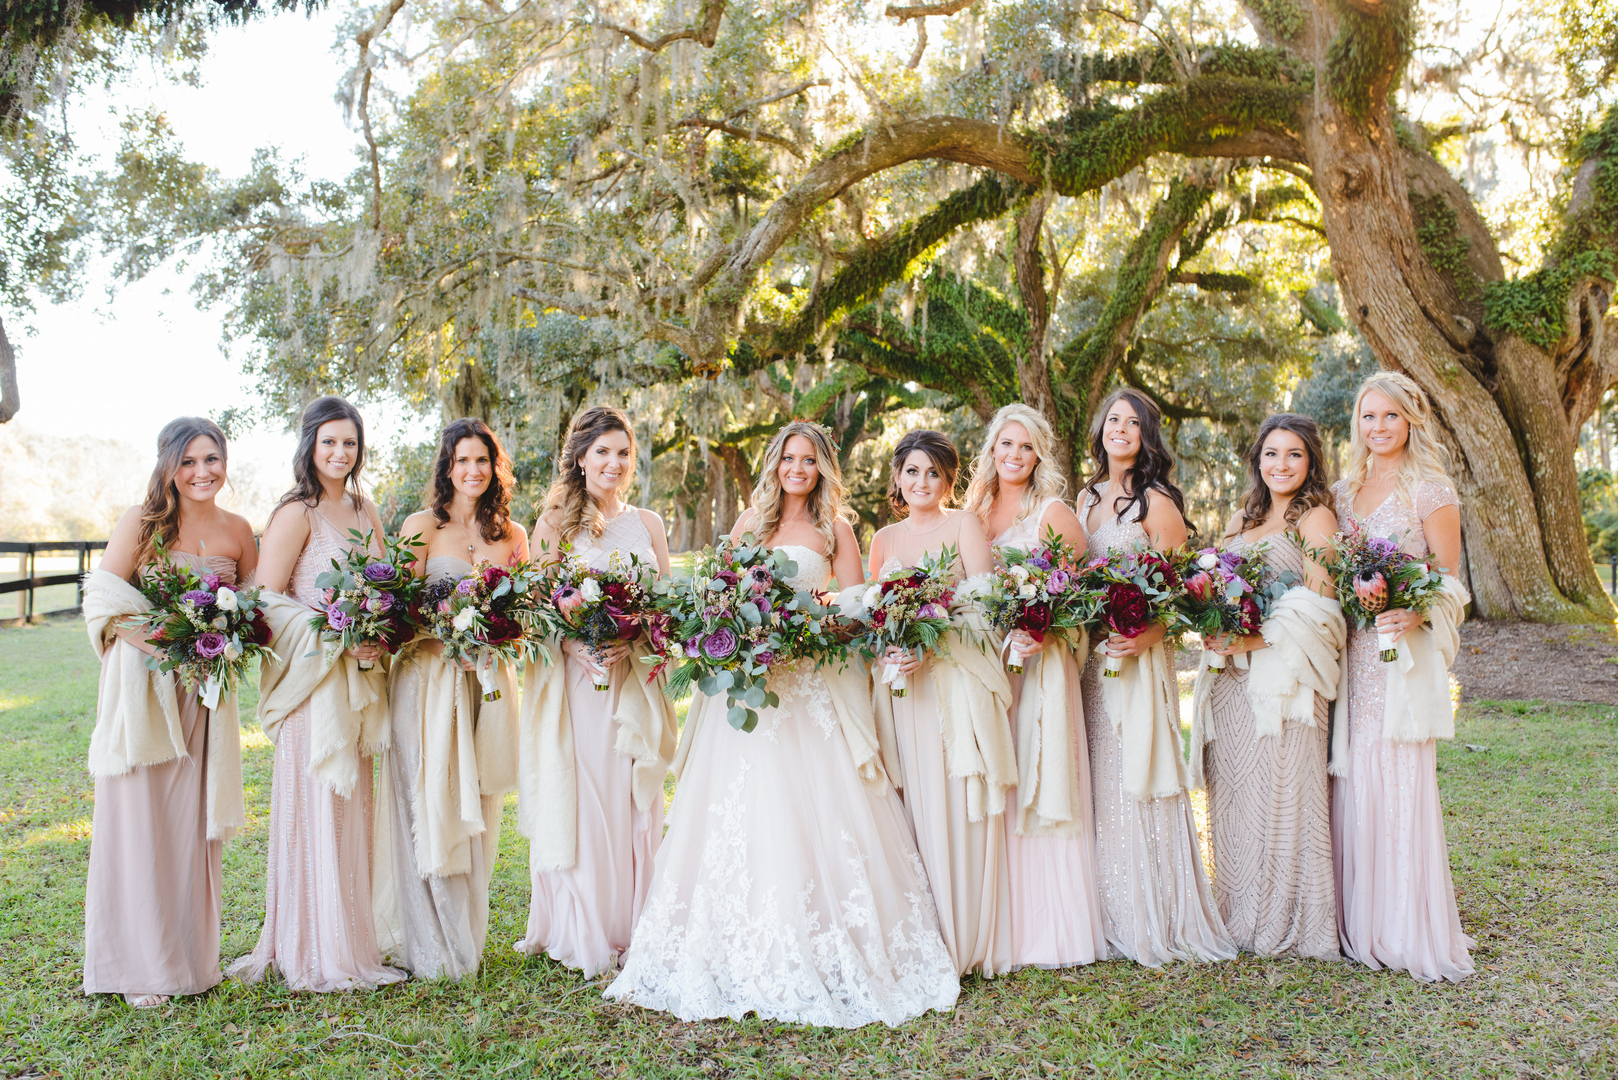 boone-hall-wedding-15(1).JPG